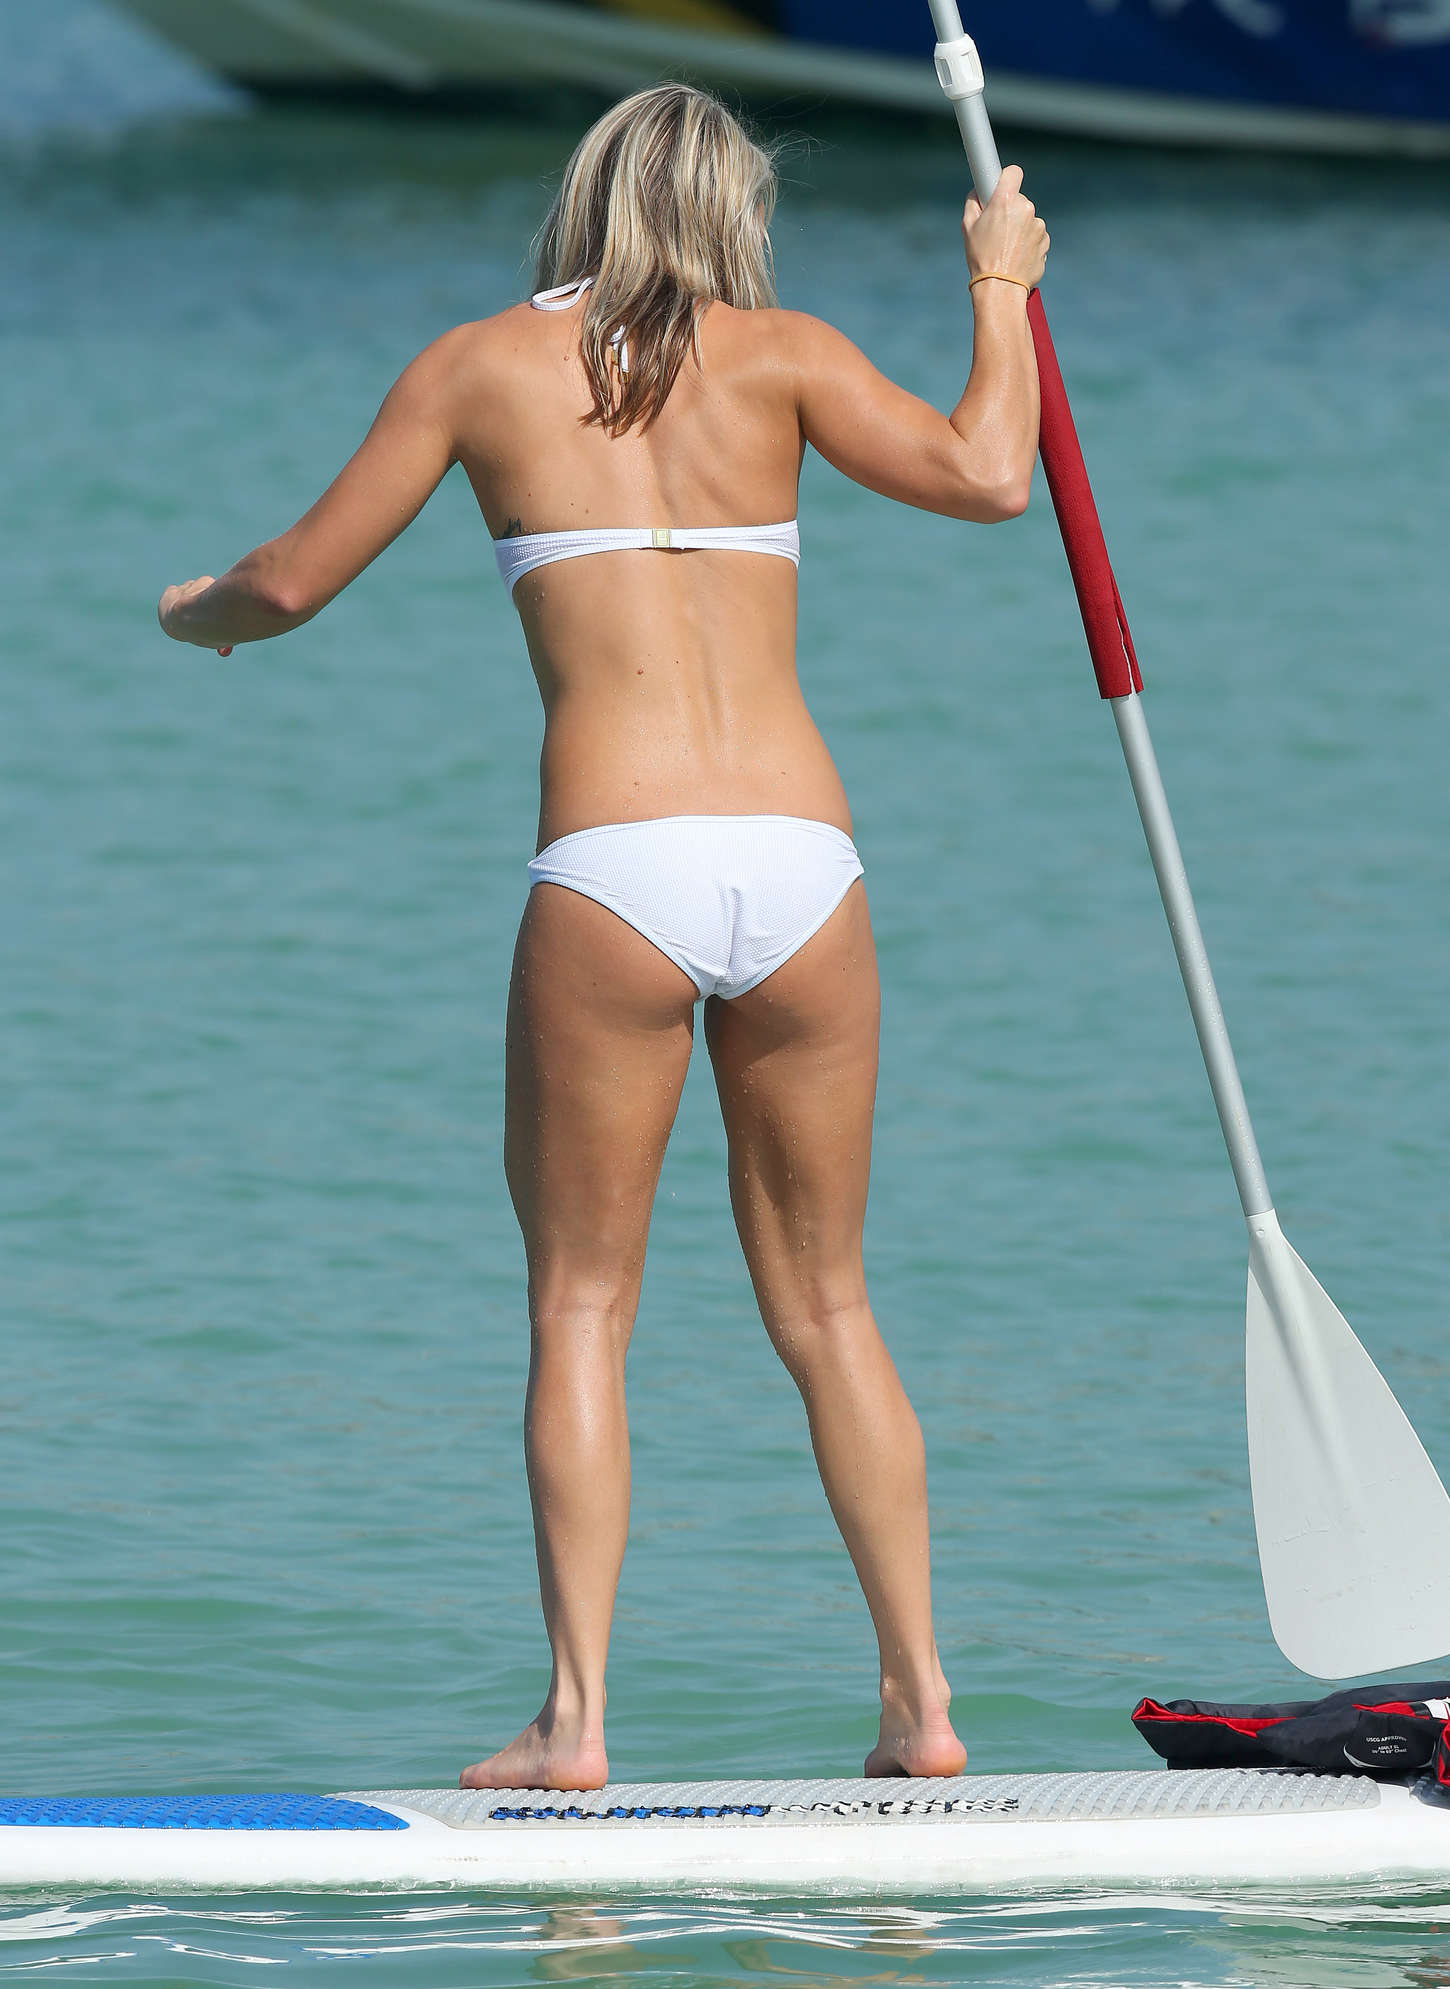 International Celebrities: Chloe Madeley in Bikini